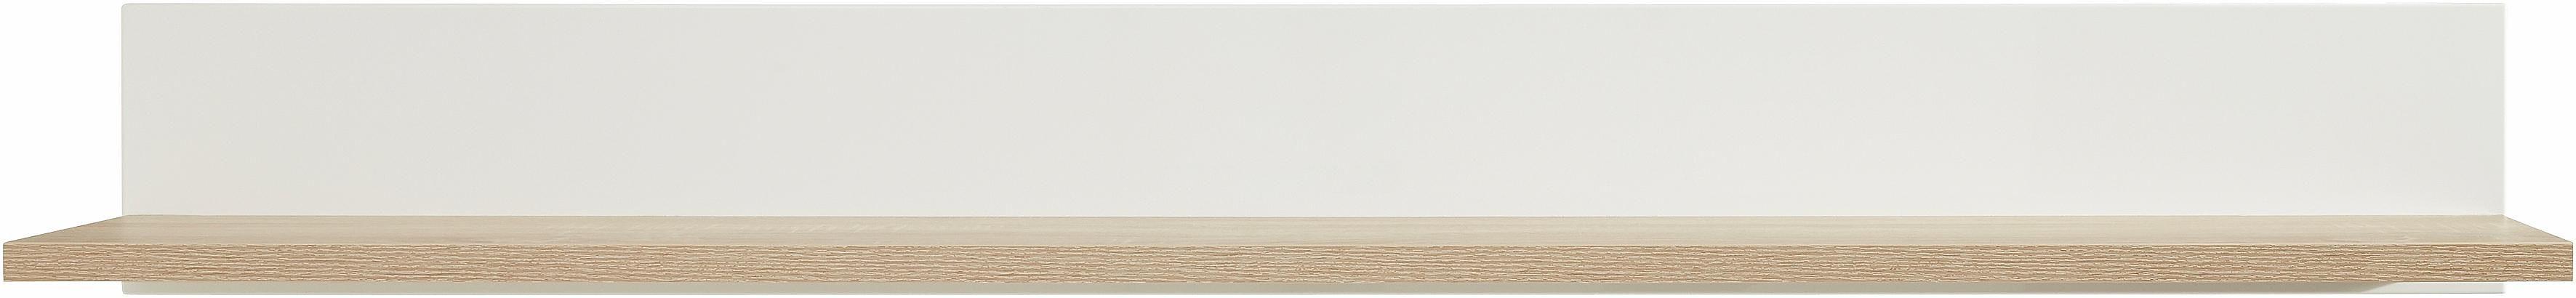 Wandbord, Breite 180 cm